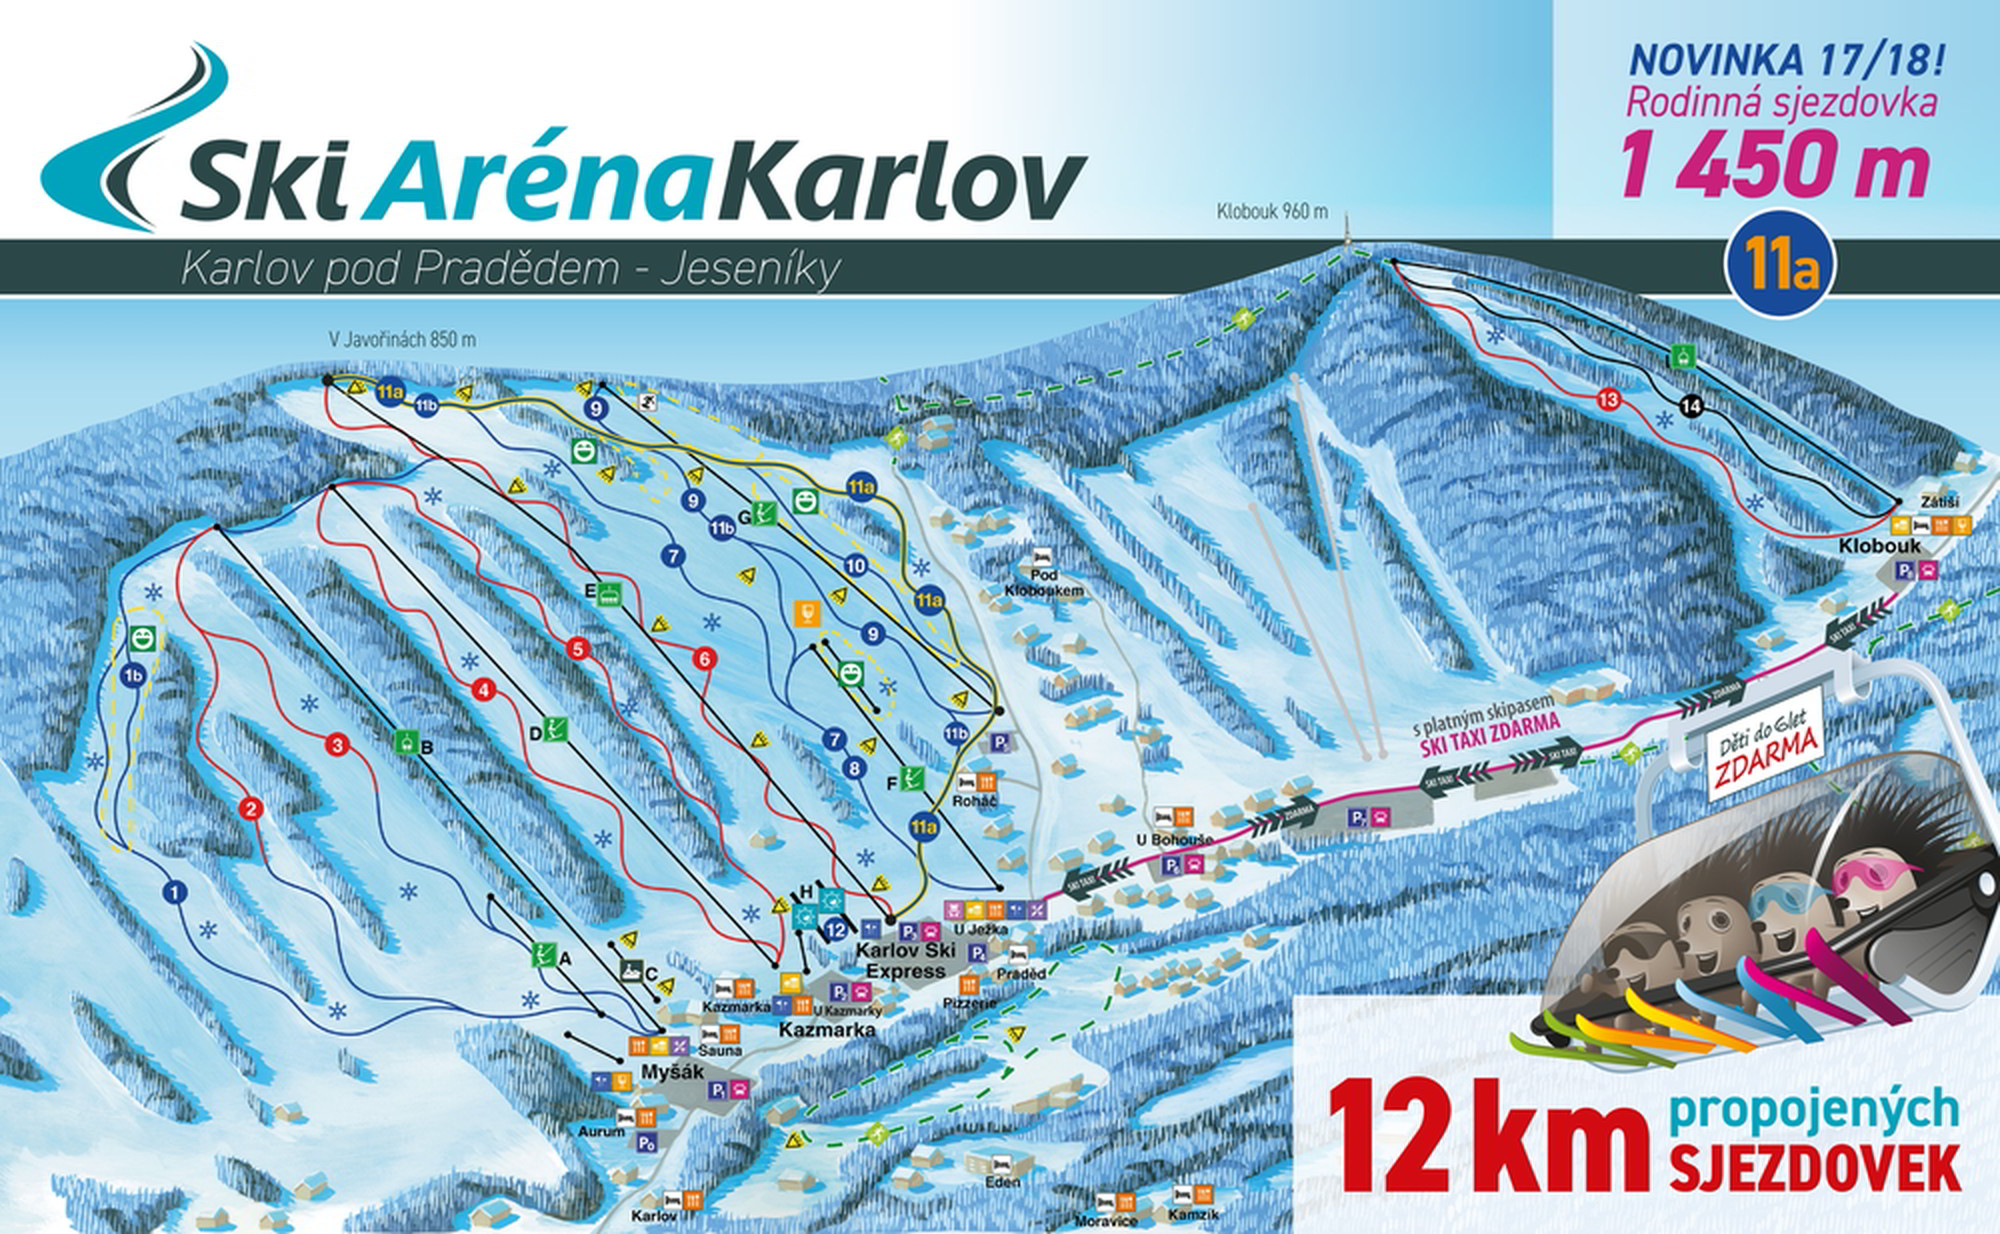 Skiareál Karlov pod Pradědem